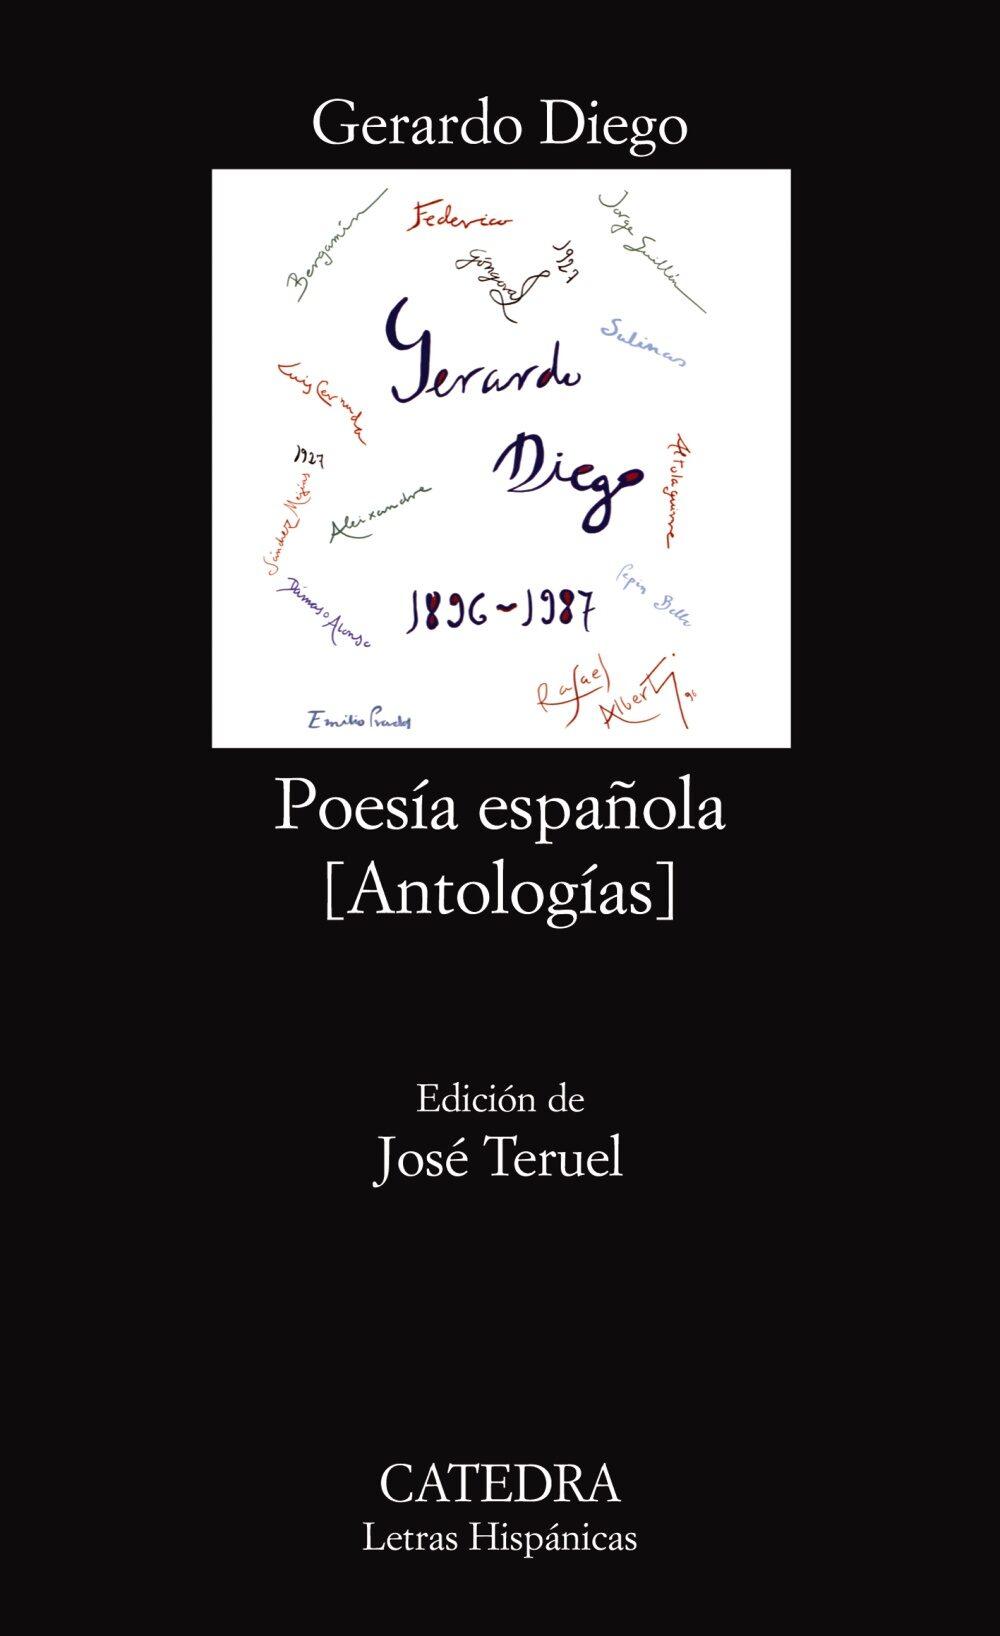 Poesia Española (antologias) - Diego Cendoya Gerardo